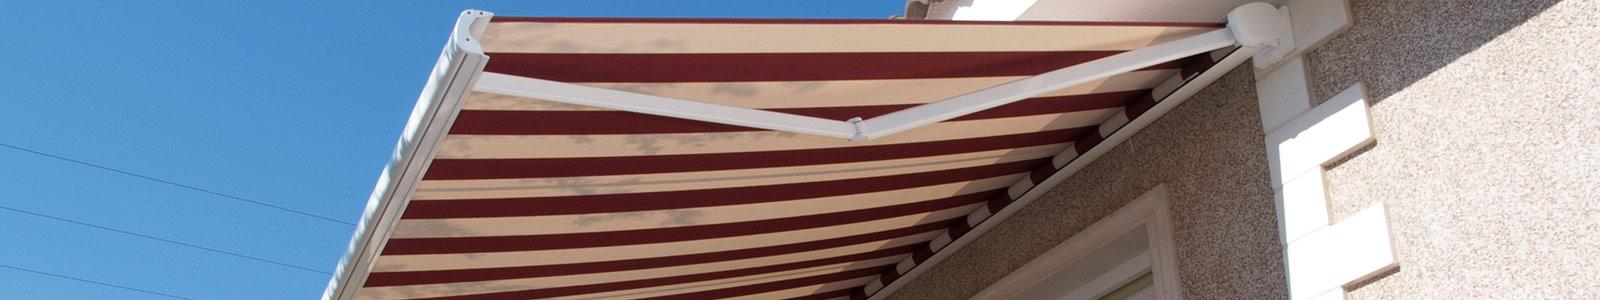 Fabricacion e instalacion de toldos en majadahonda madrid - Toldos en majadahonda ...